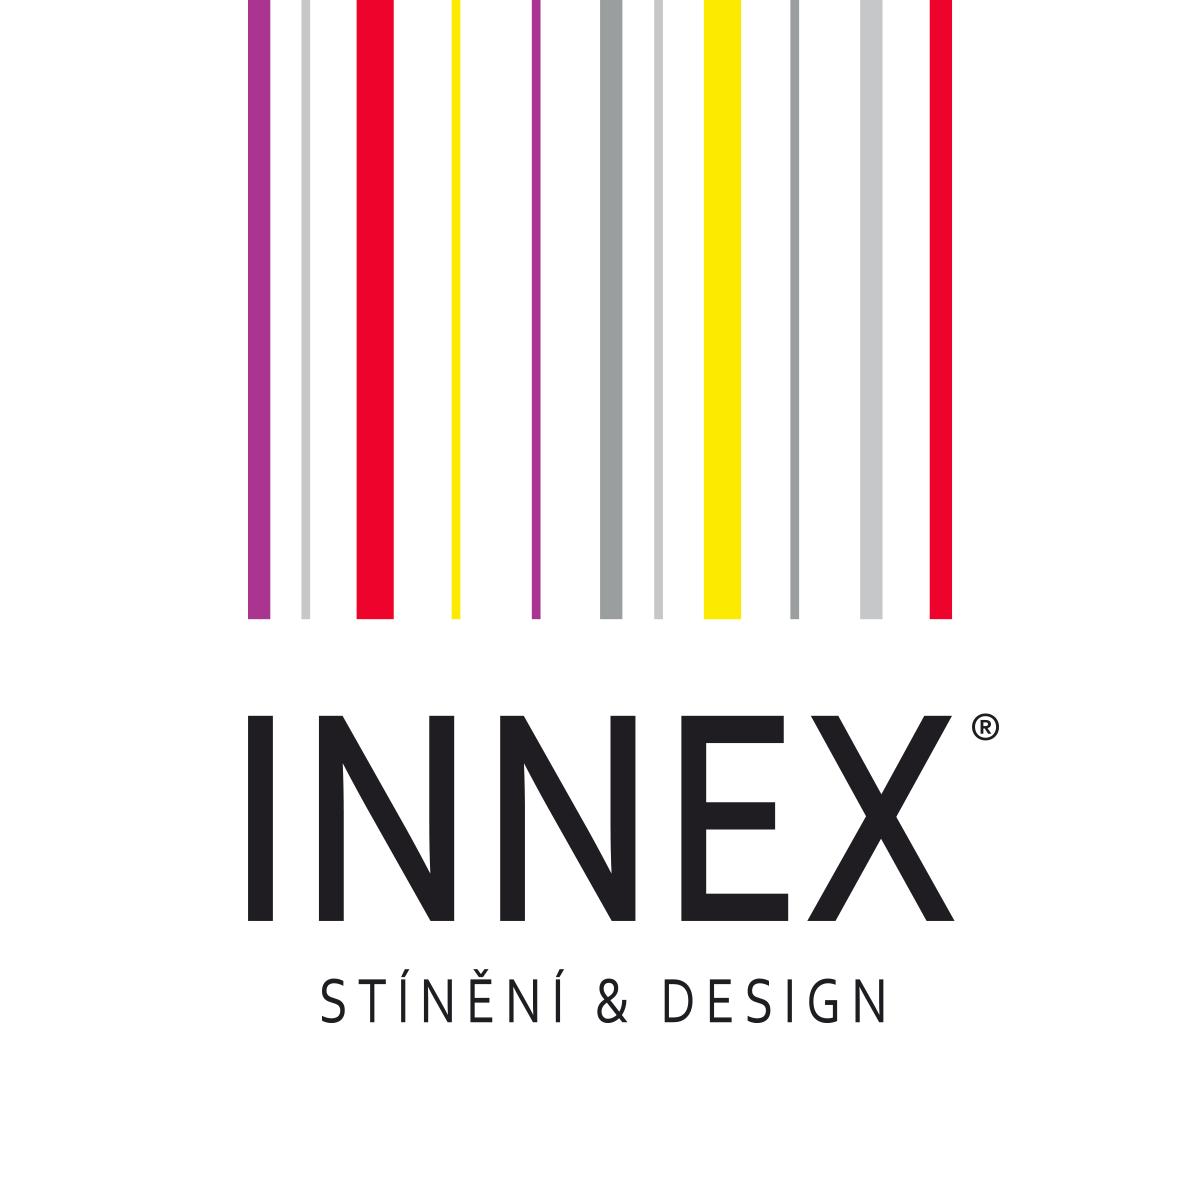 INNEX - Stínění a design